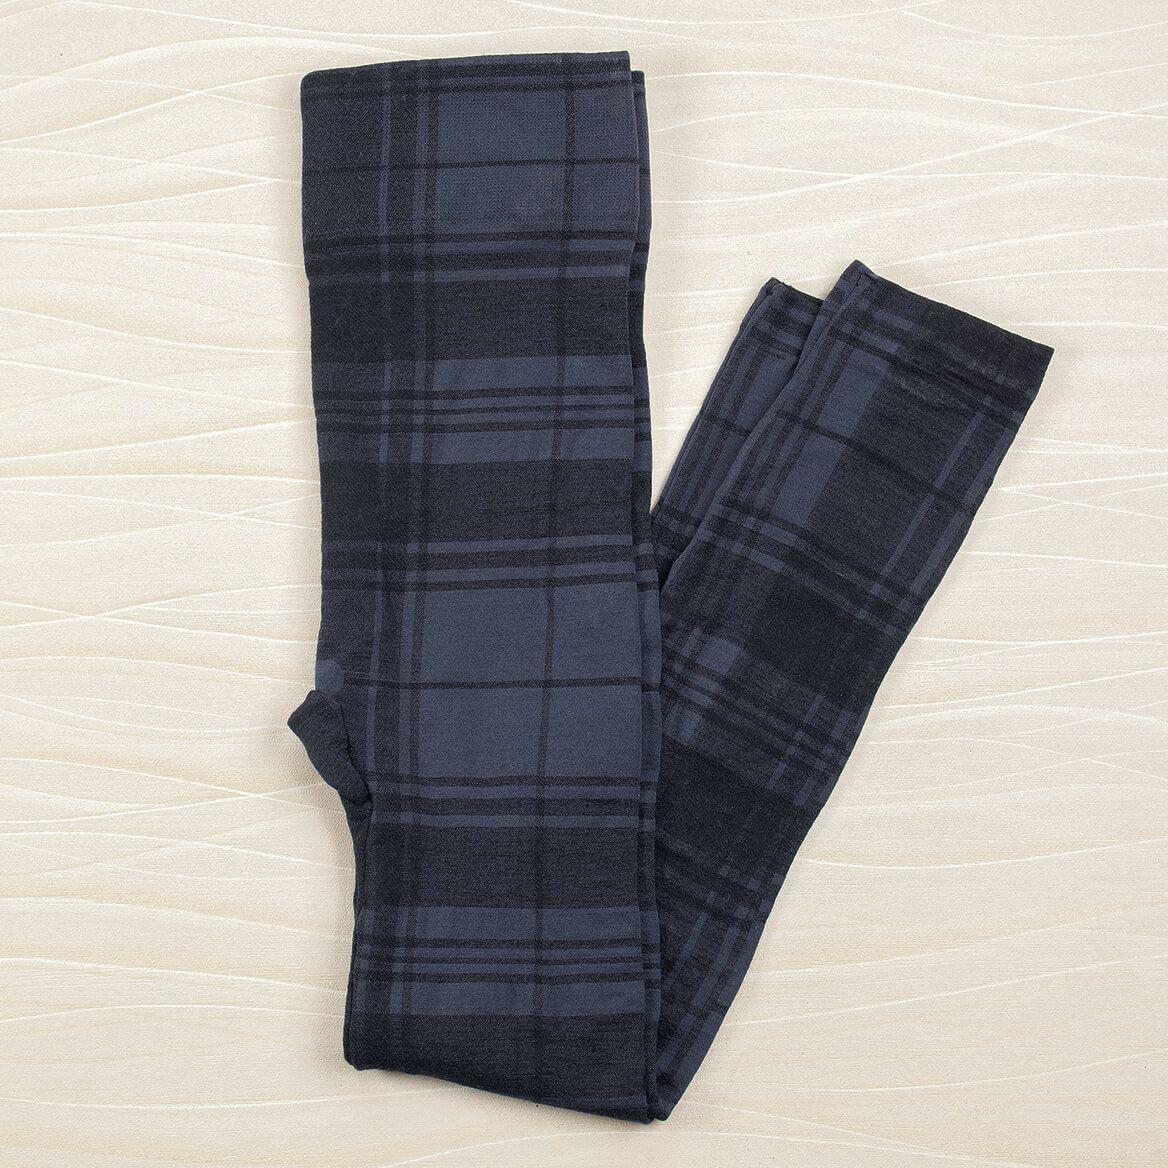 Britt's Knits® Fleece-Lined Leggings-372329